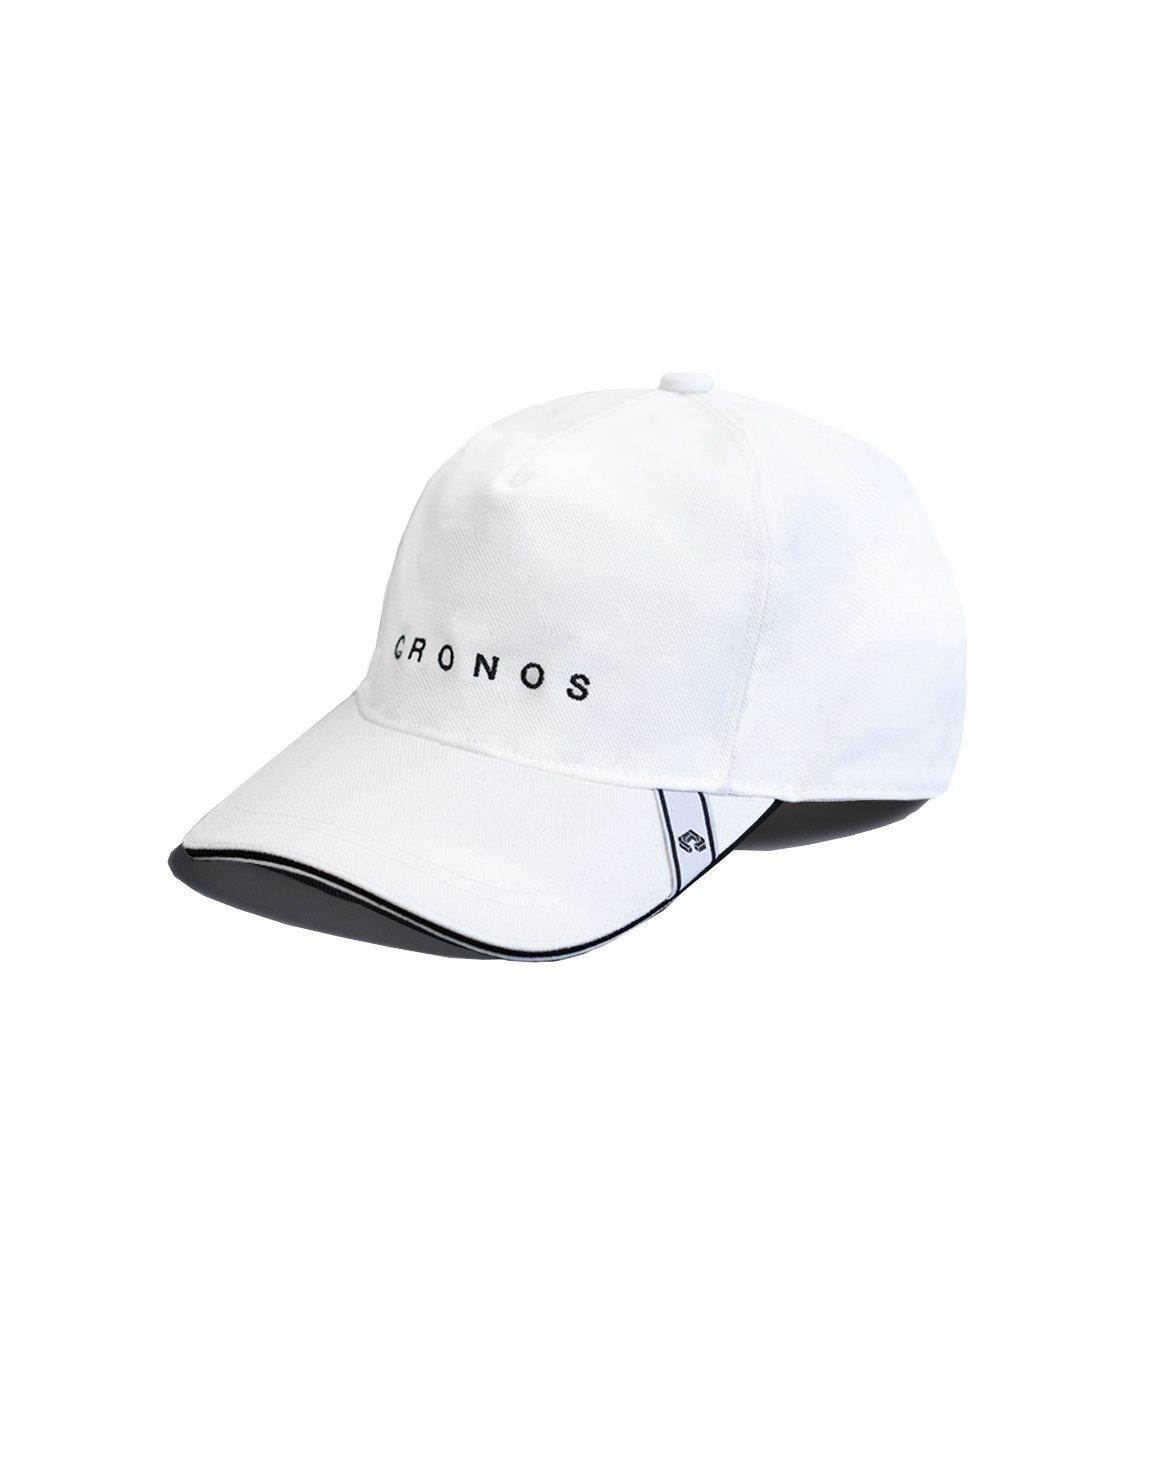 CRONOS FONT LOGO CAP【WHITE】